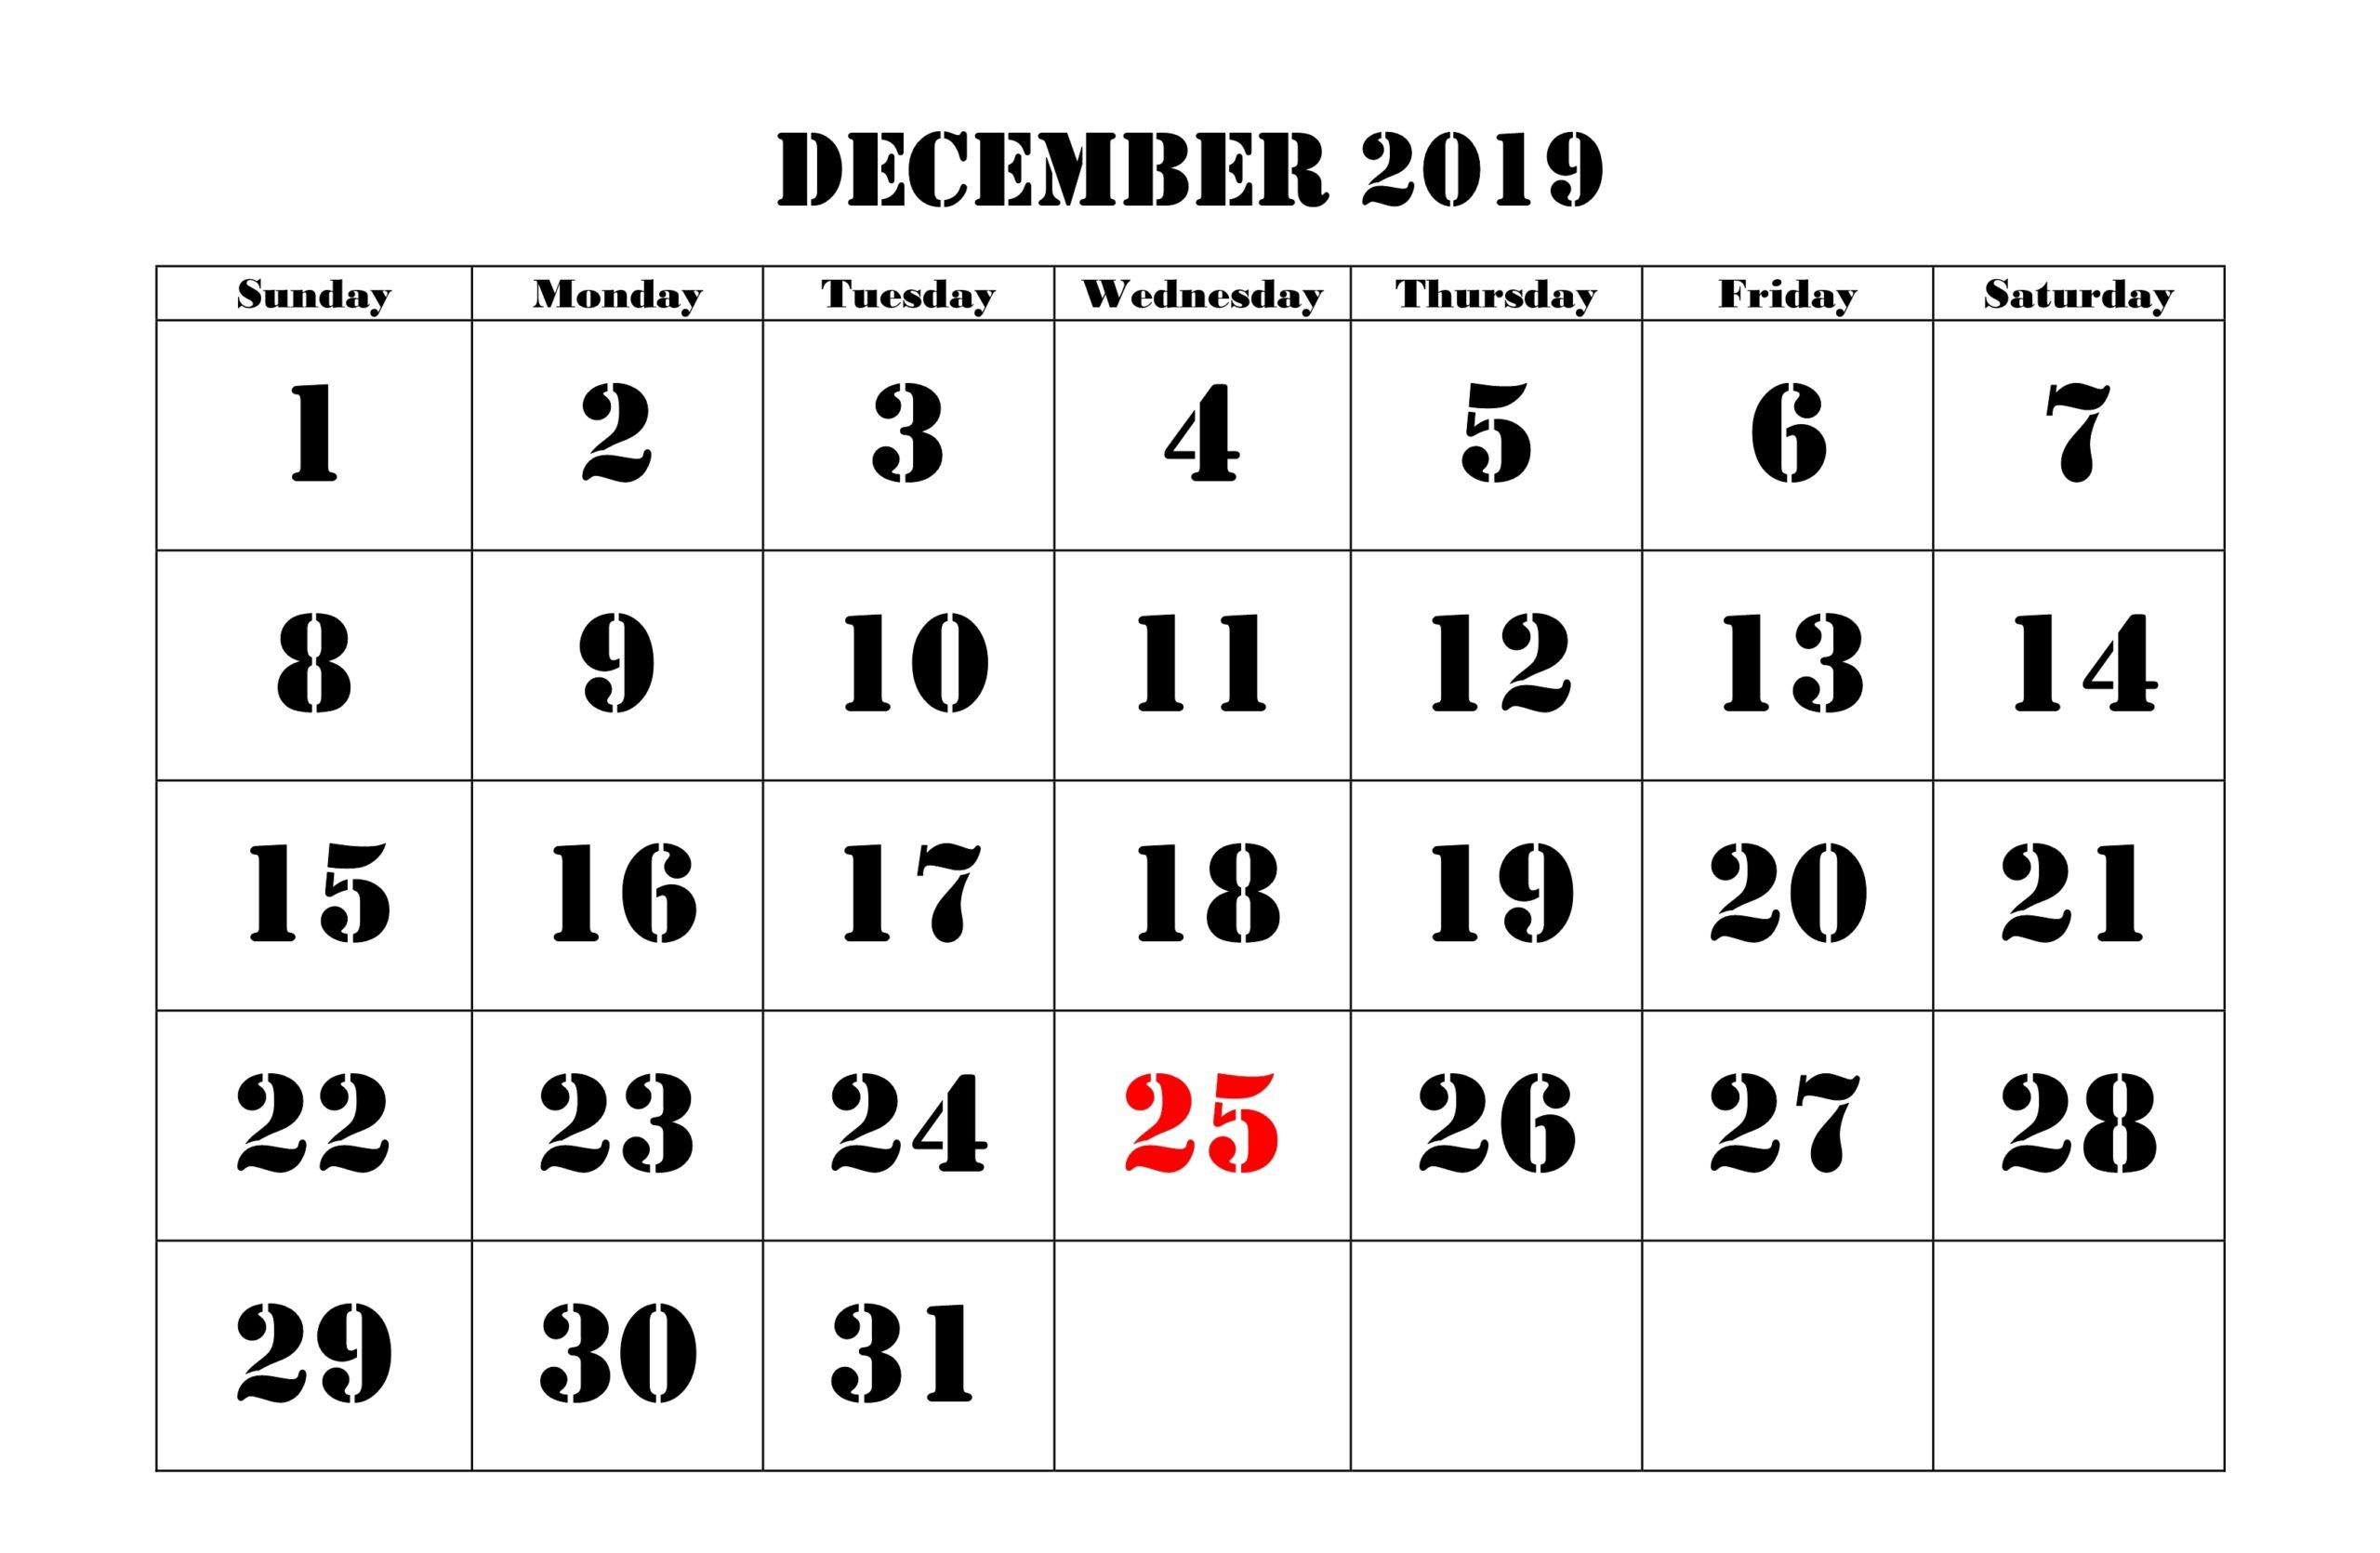 Holidays Calendar for December 2019